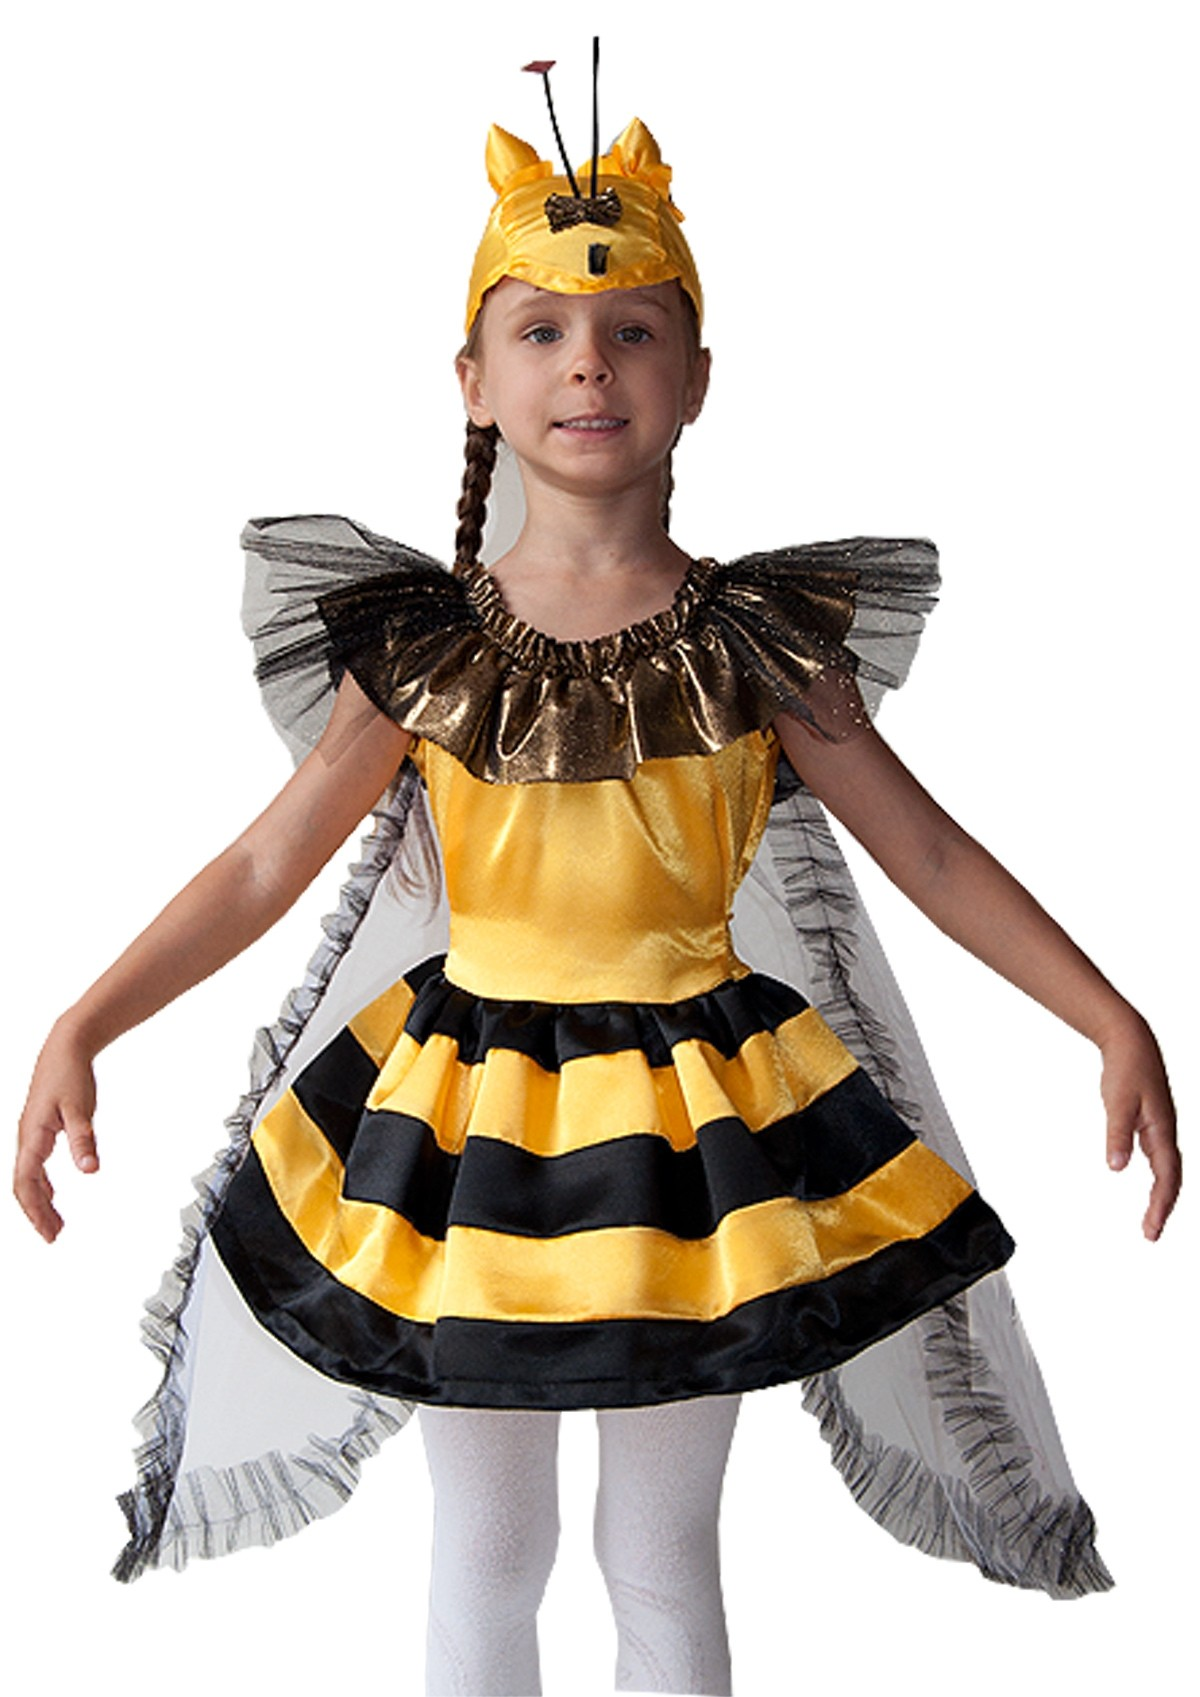 Костюм пчелки для детей (30) от Vkostume